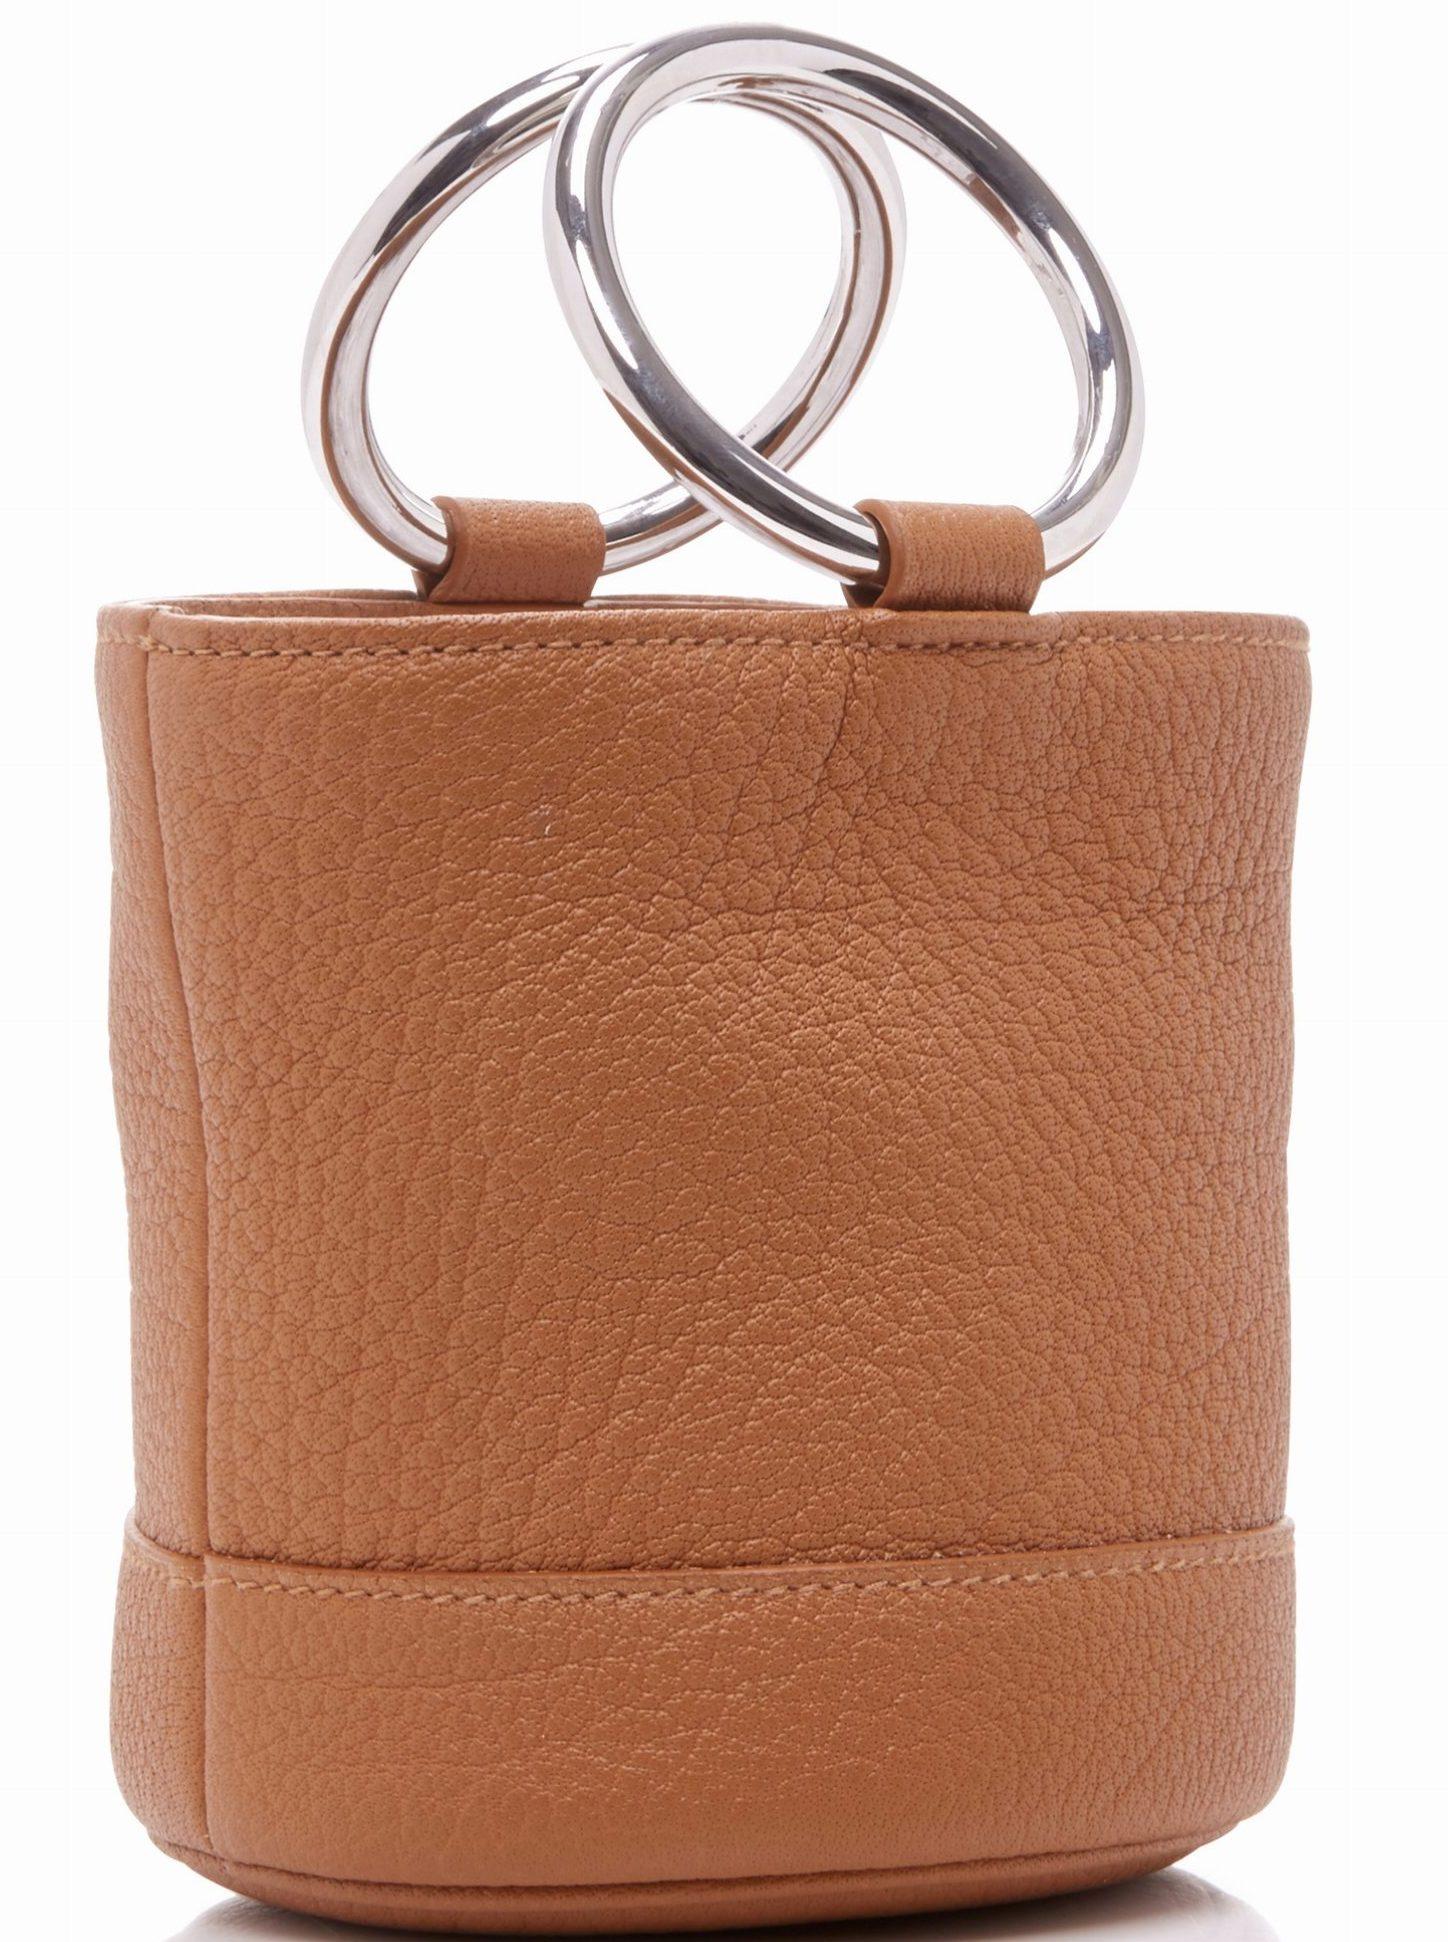 Simon Miller Bonsai 15 Bucket Bag with Strap $490